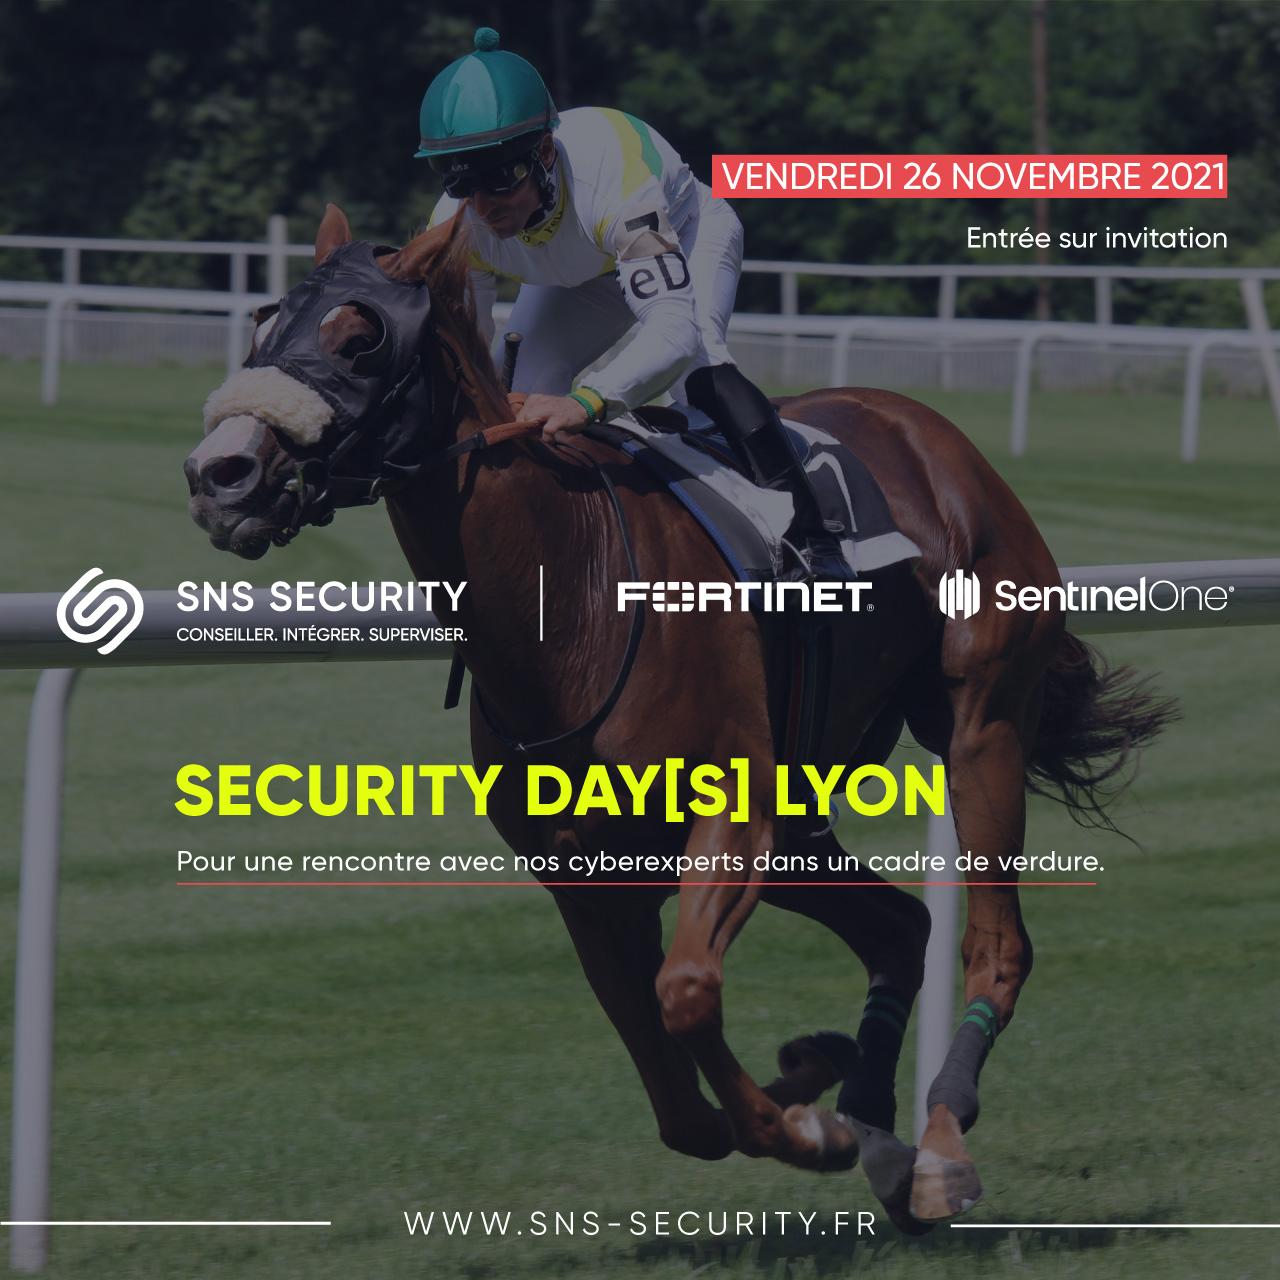 evenement security days lyon fortinet sentinelone